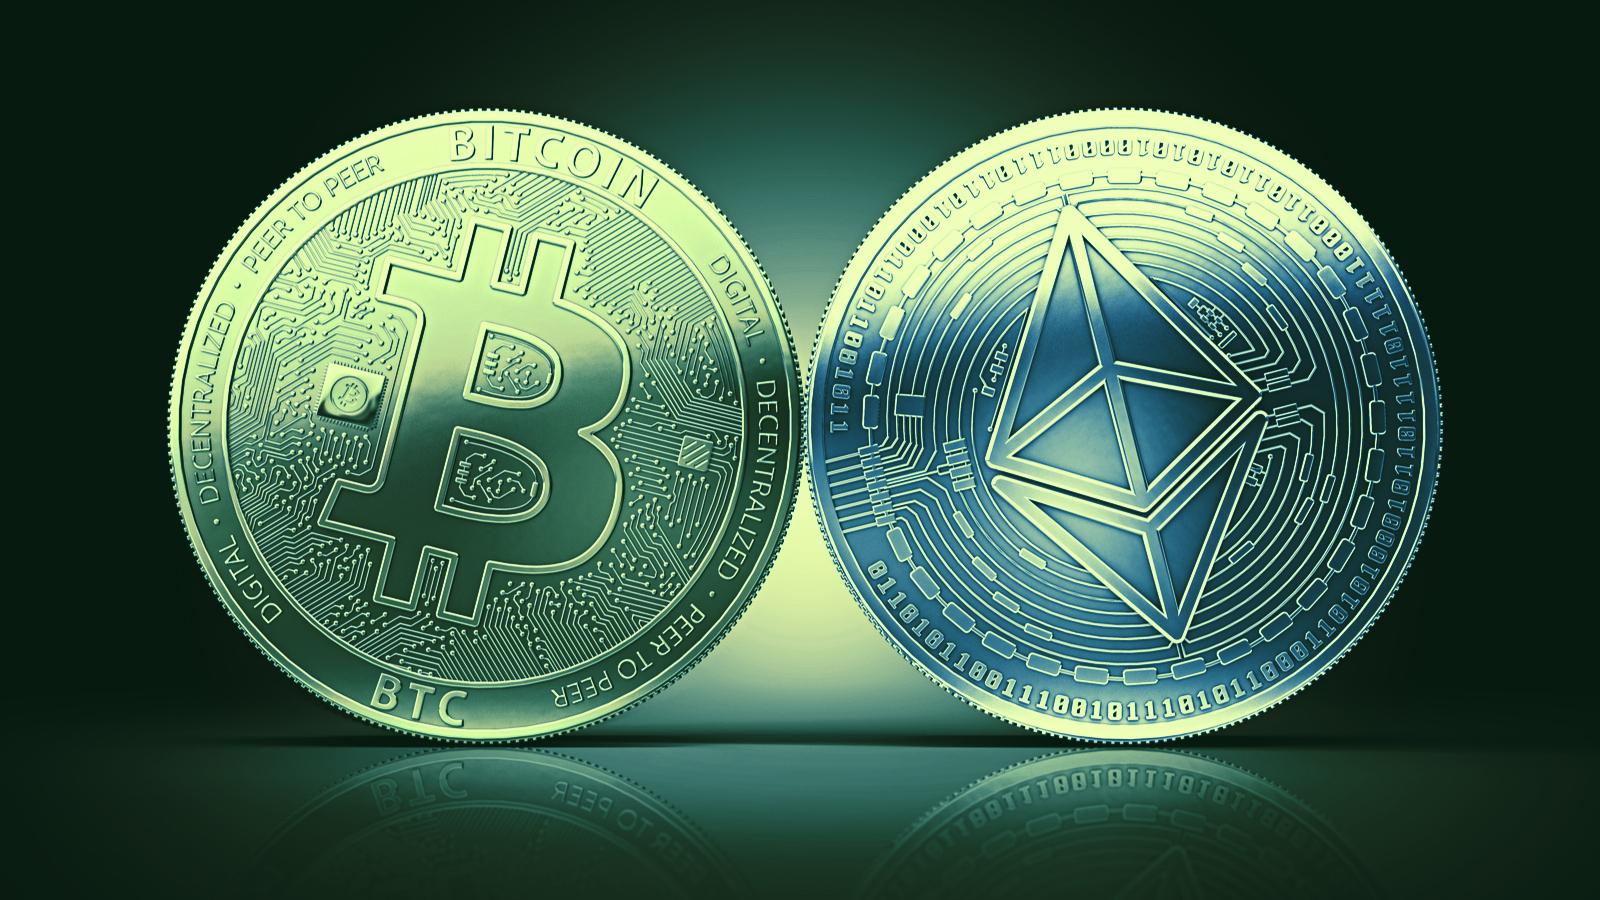 Cardano's market cap flips Bitcoin Cash (BCH) after ADA rallies by 100% – Accu-rate